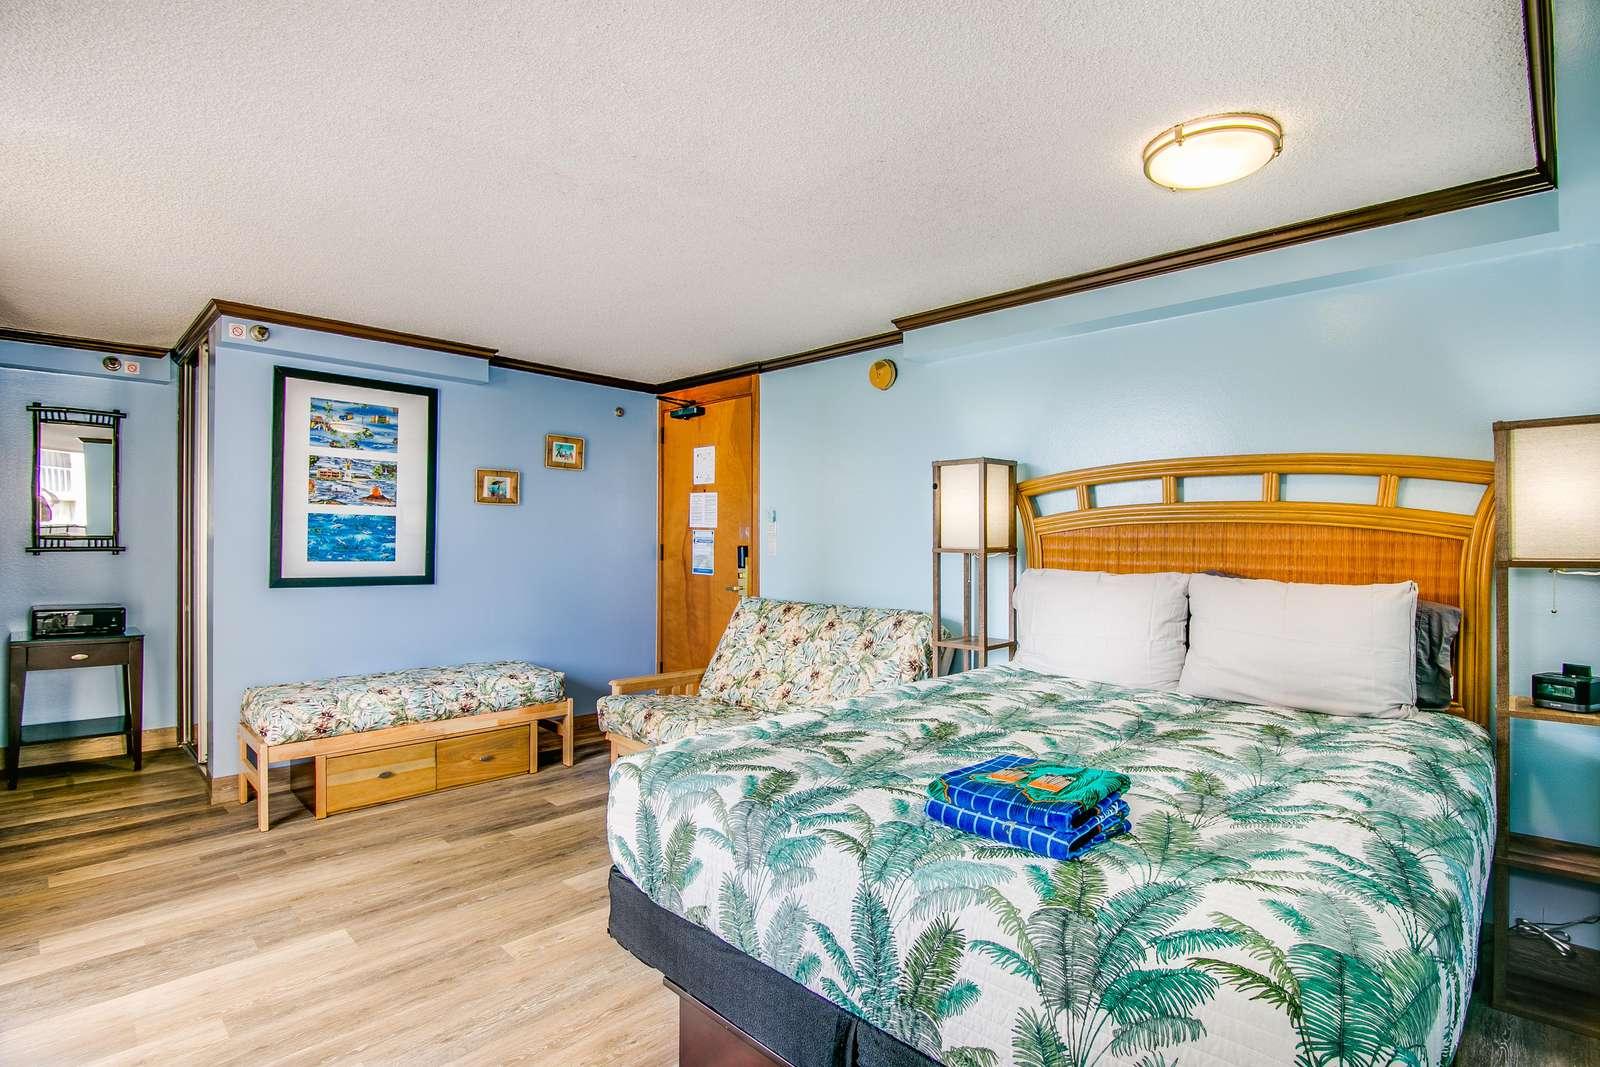 Comfortable queen mattress and new Hawaiian bedspread